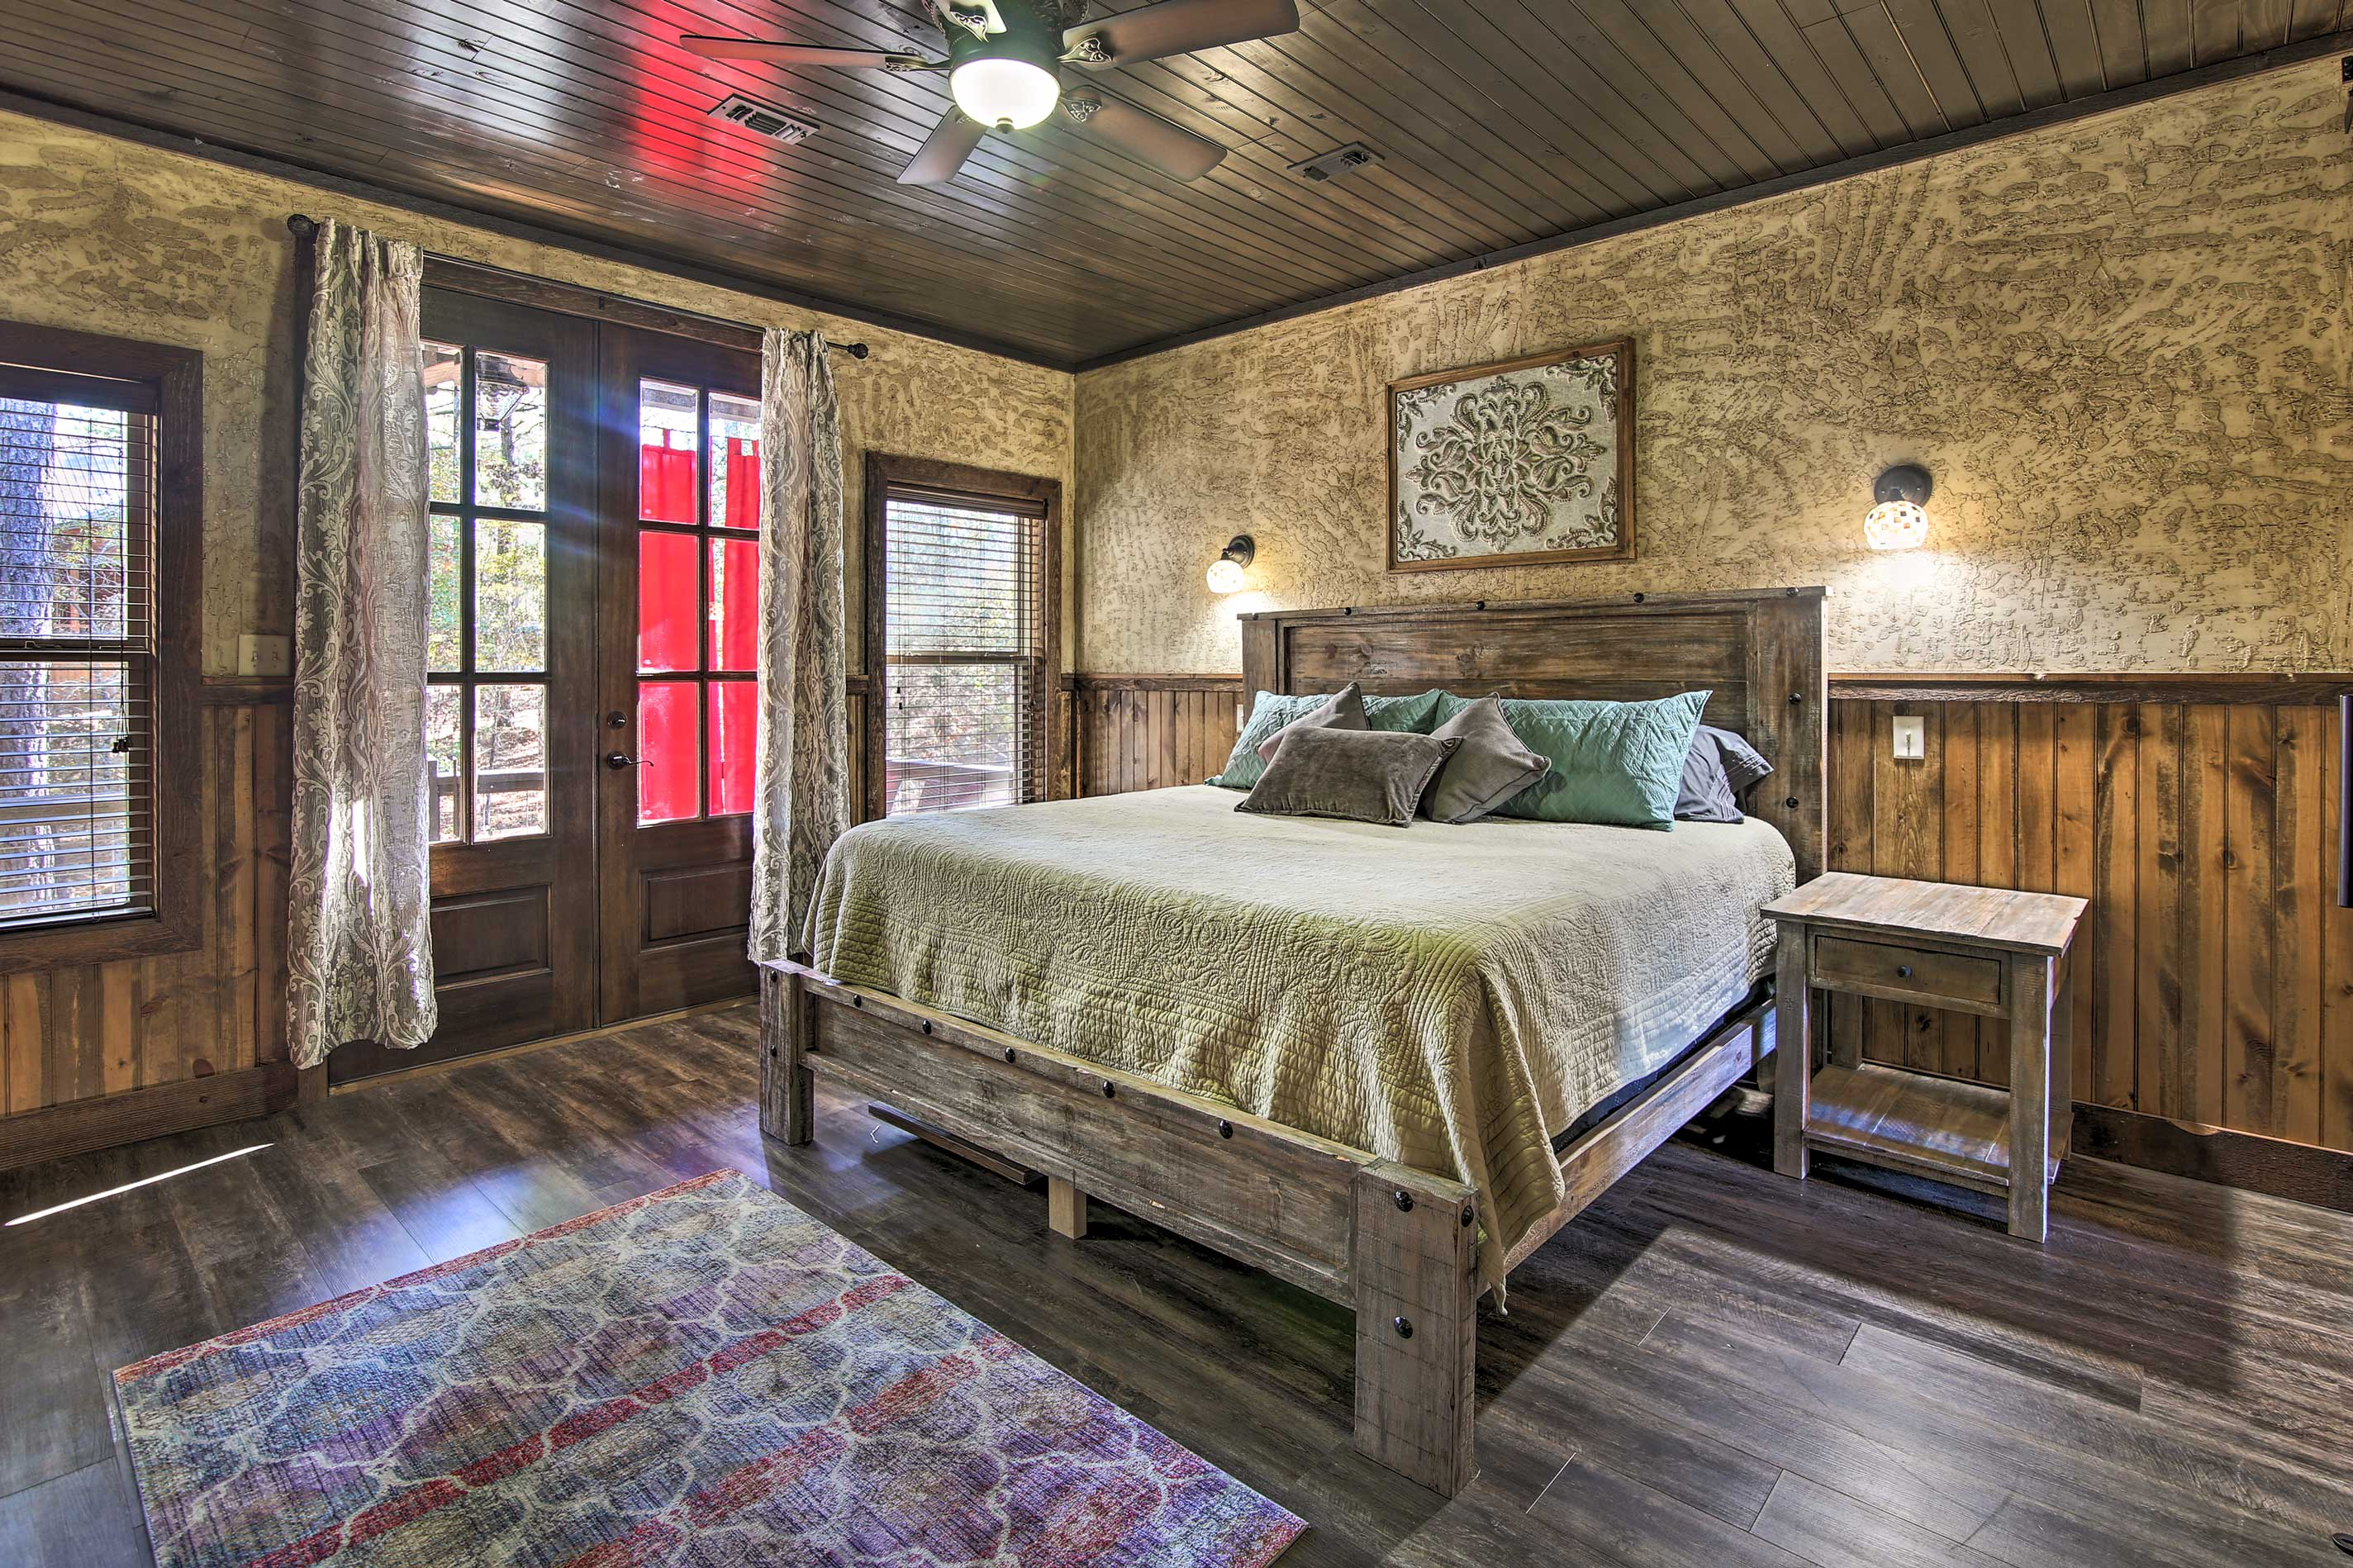 Step out onto the balcony as soon as you awake.